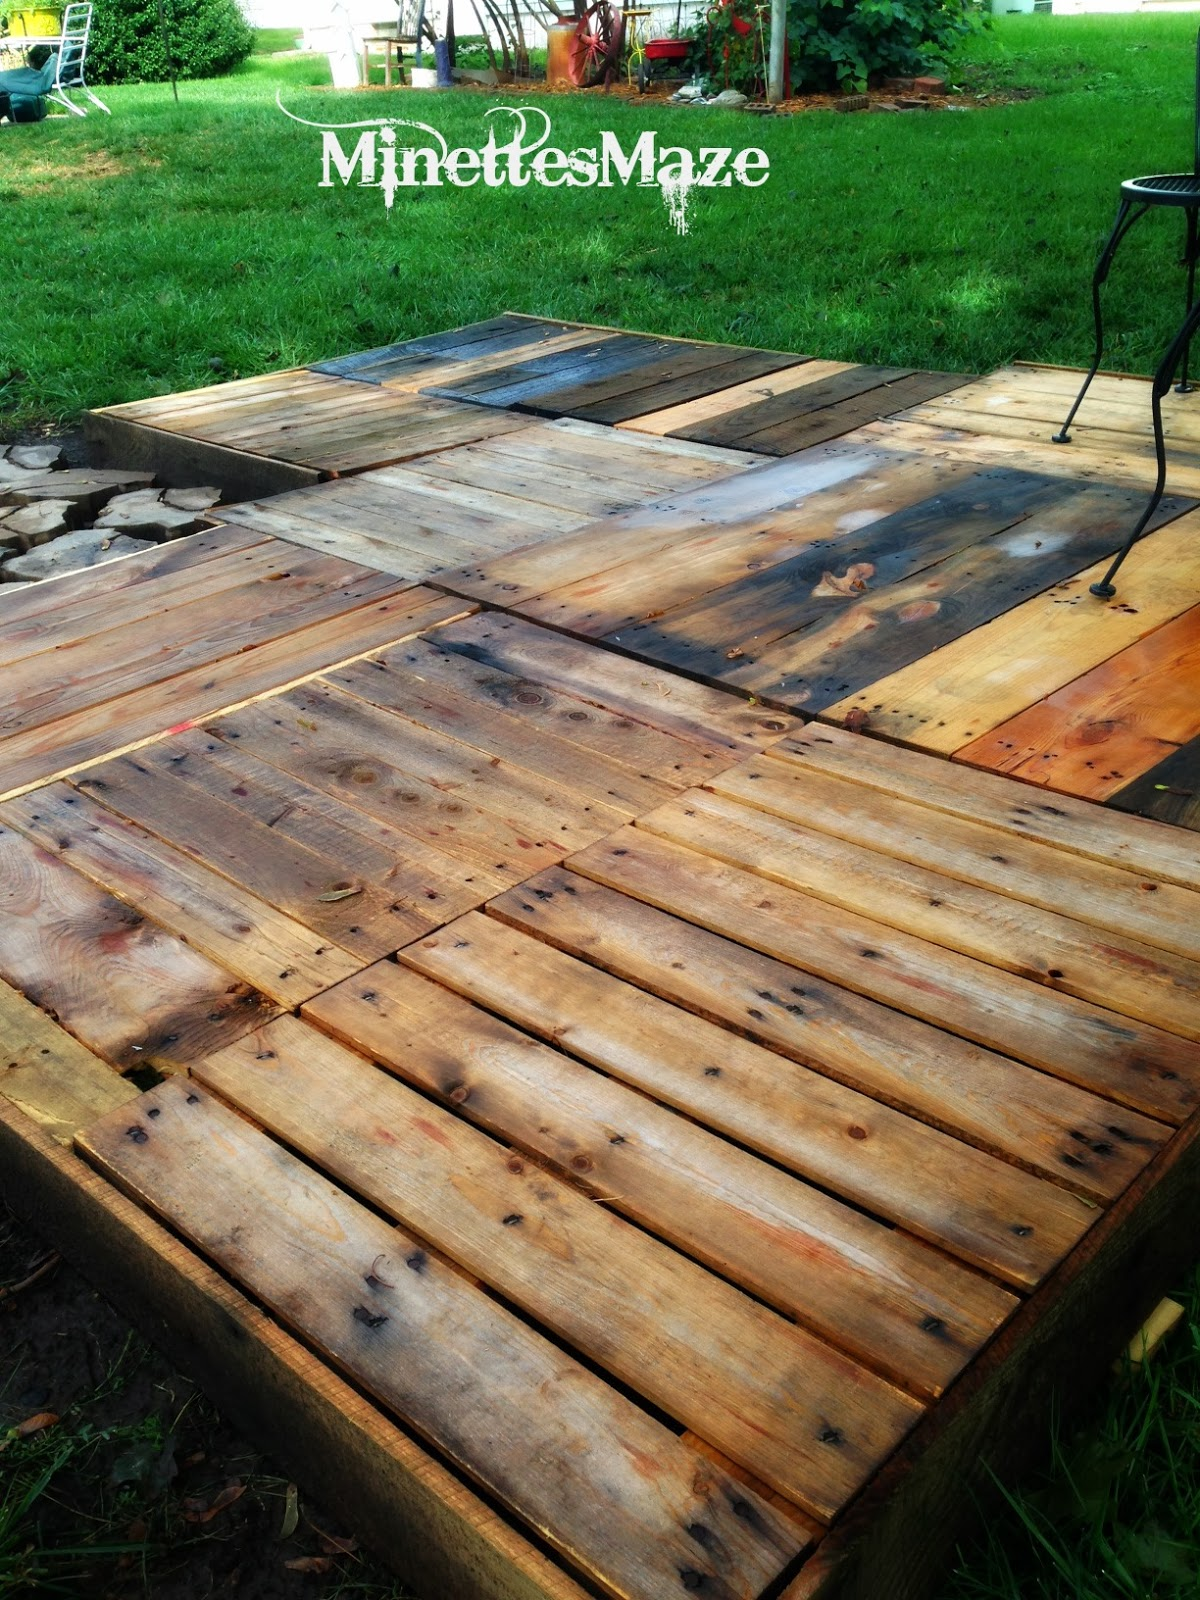 Do It Yourself Home Design: MinettesMaze: DIY Pallet Deck